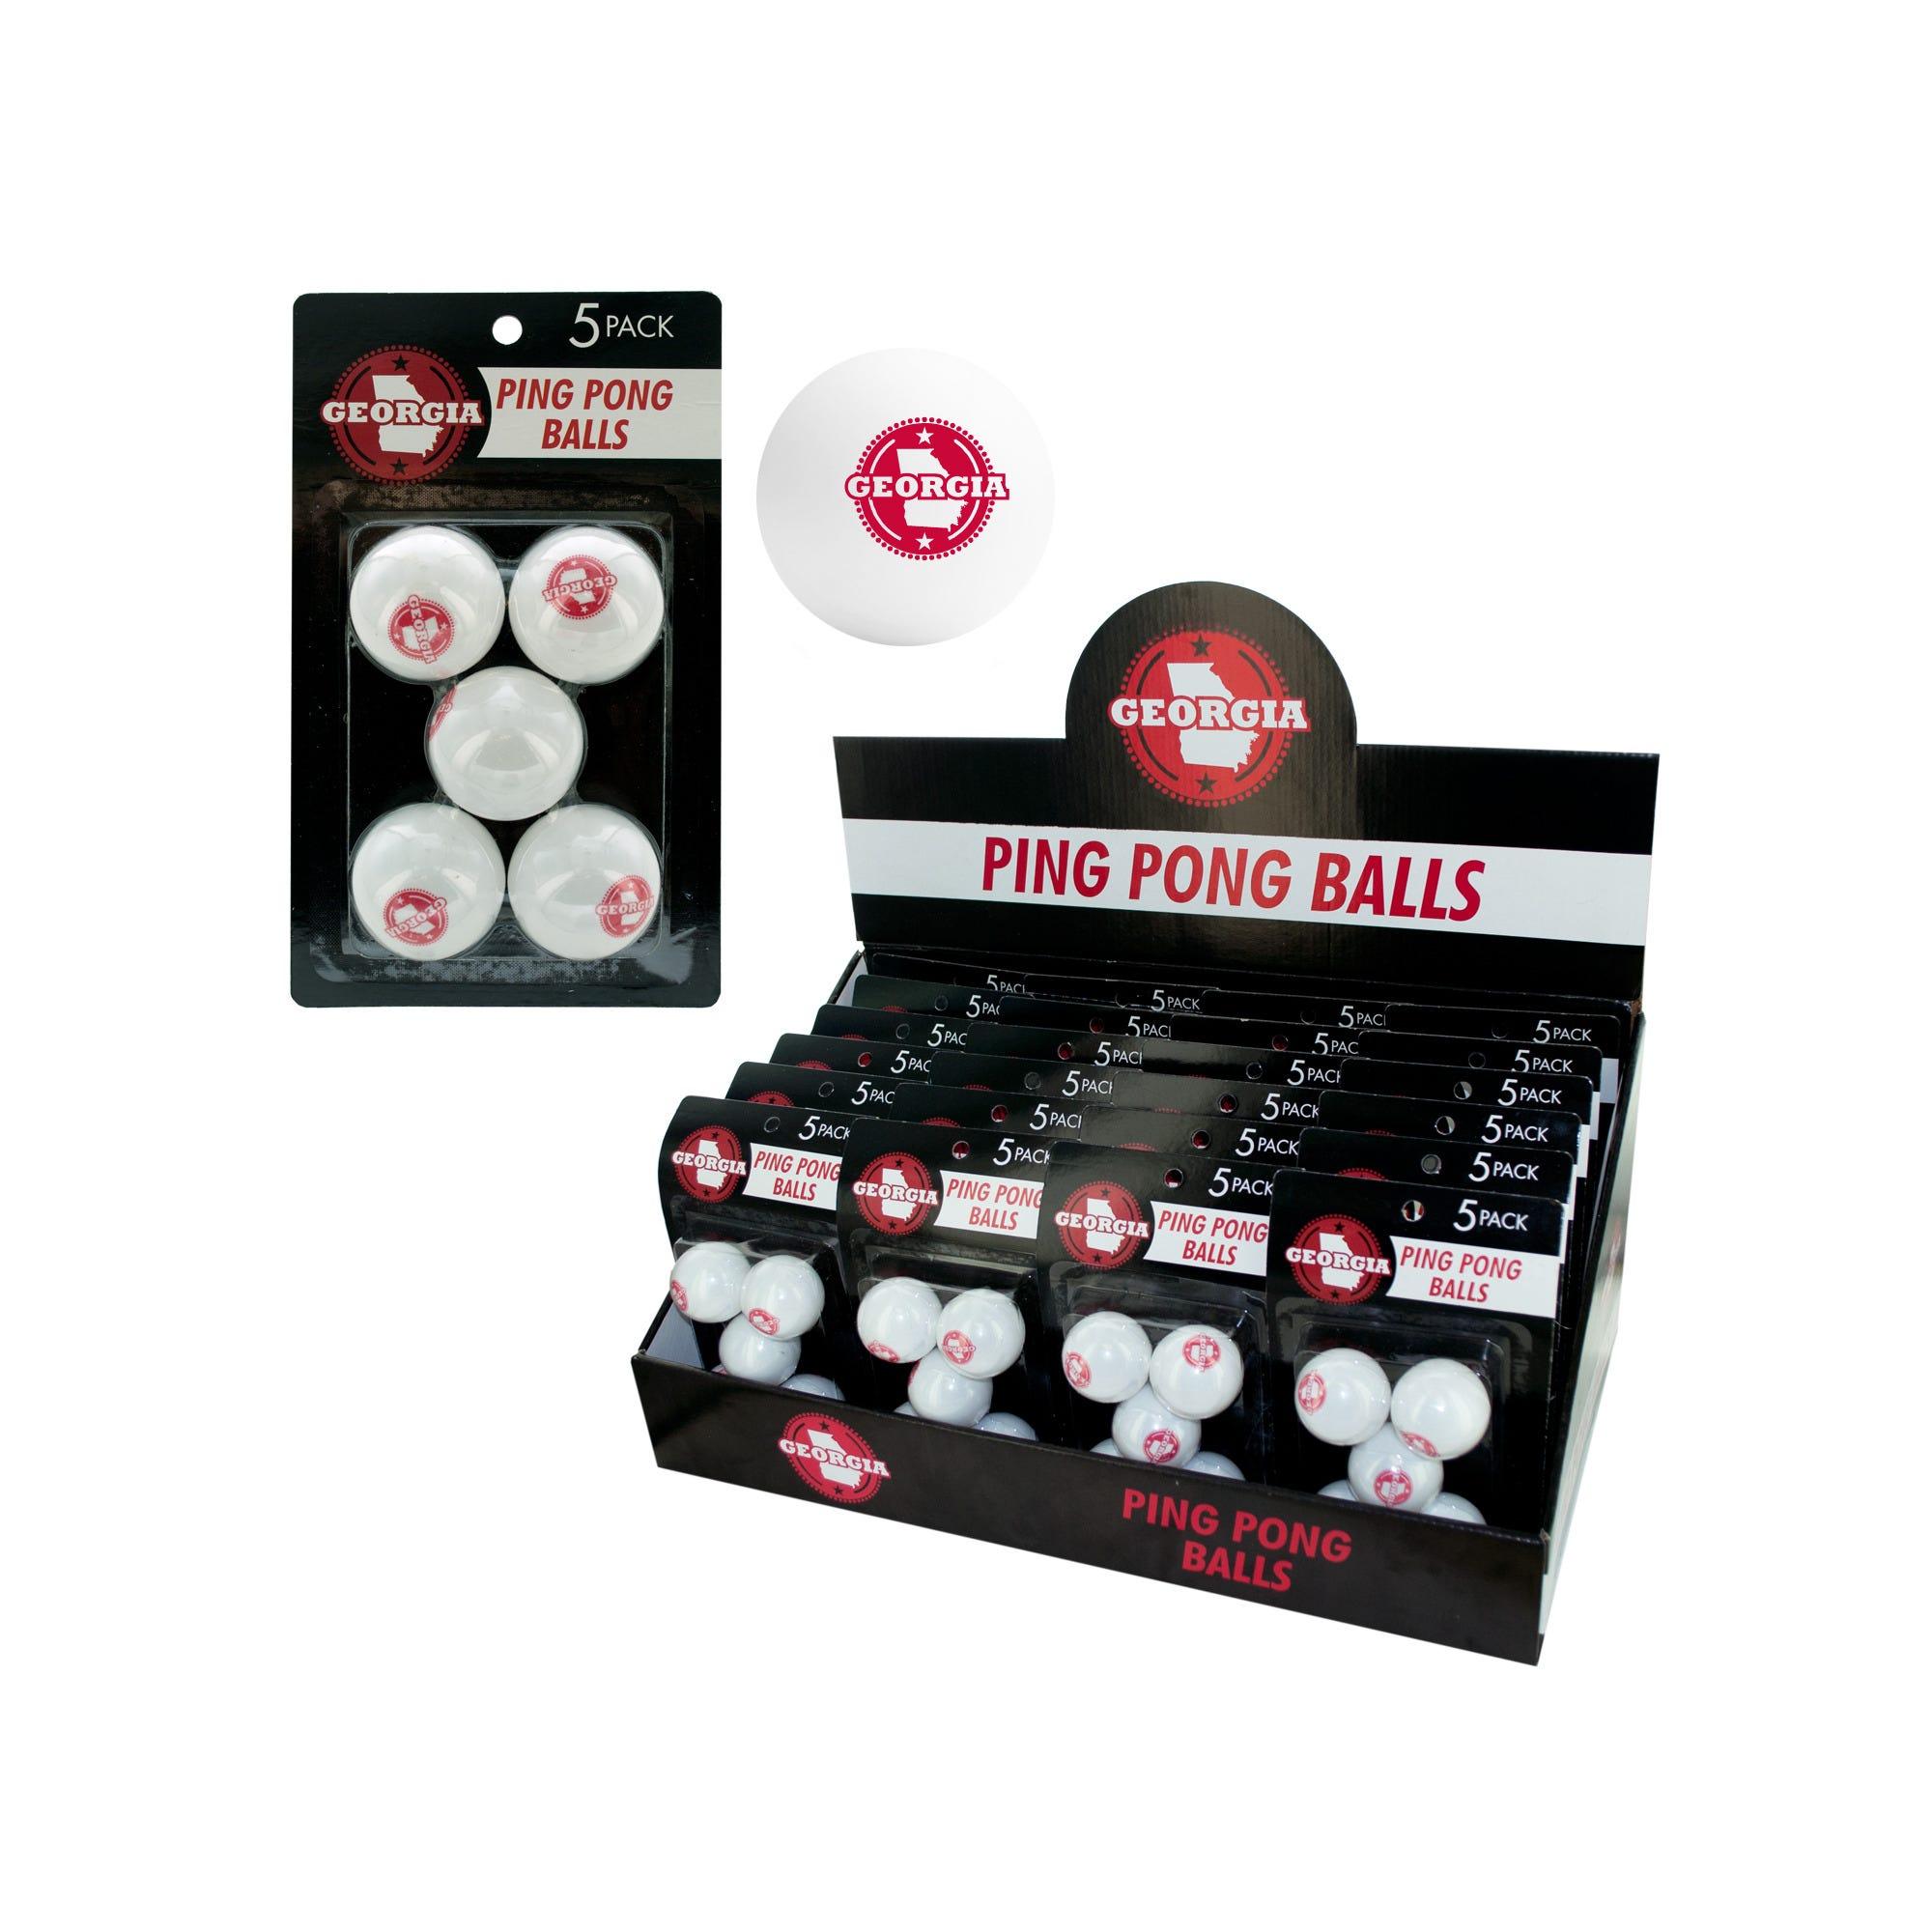 georgia-PING-PONG-balls-countertop-display